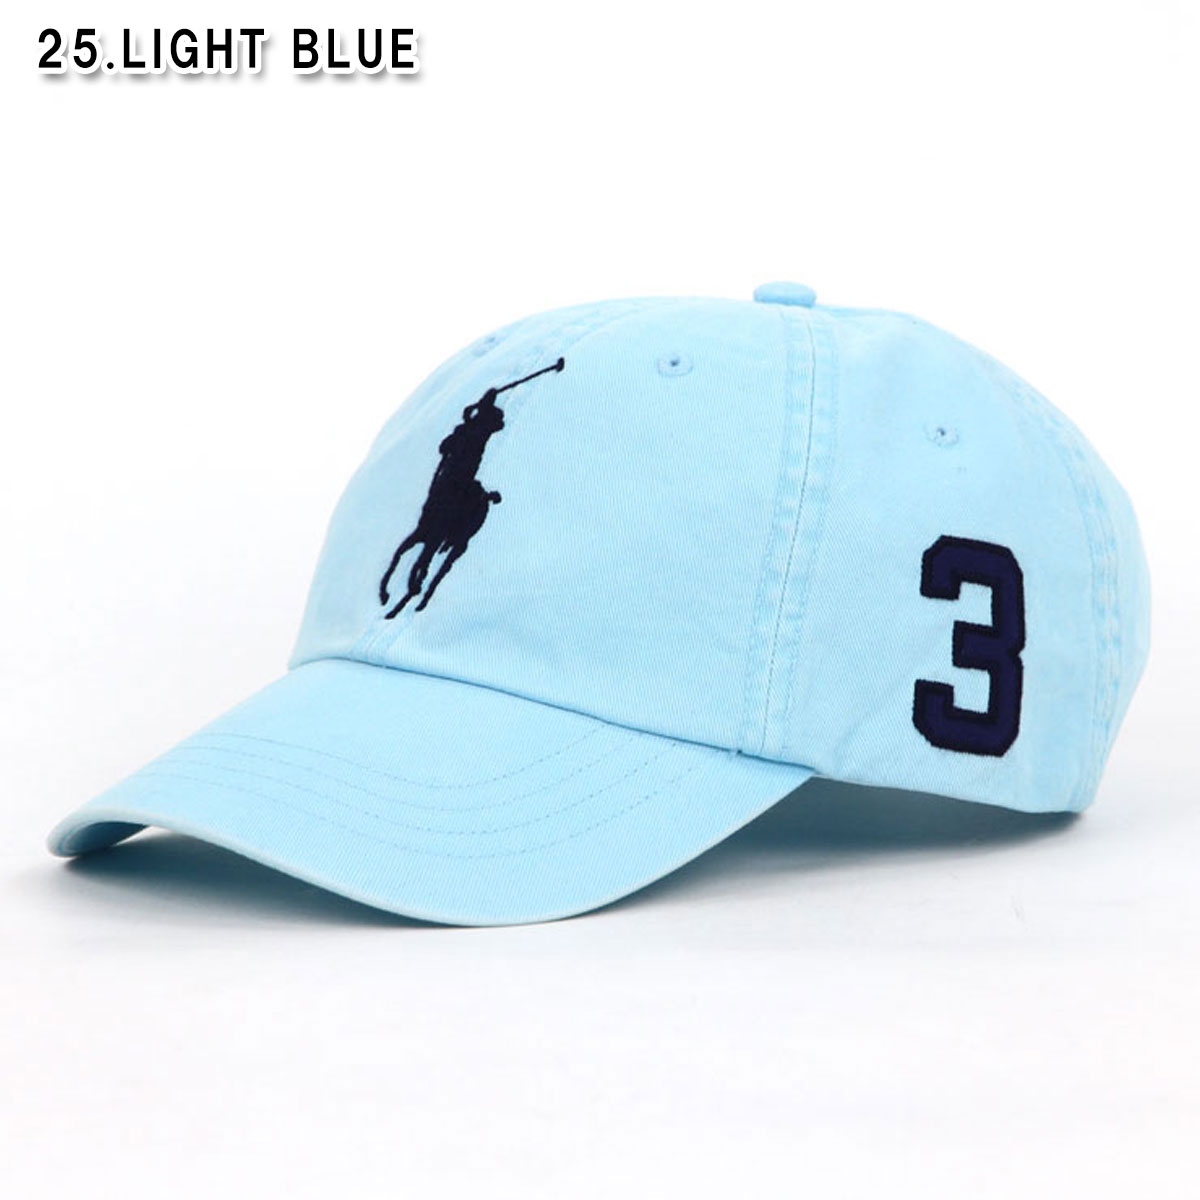 17a584bf52254 Polo Ralph Lauren POLO RALPH LAUREN regular article hat big pony numbering  baseball cap Big Pony Hat